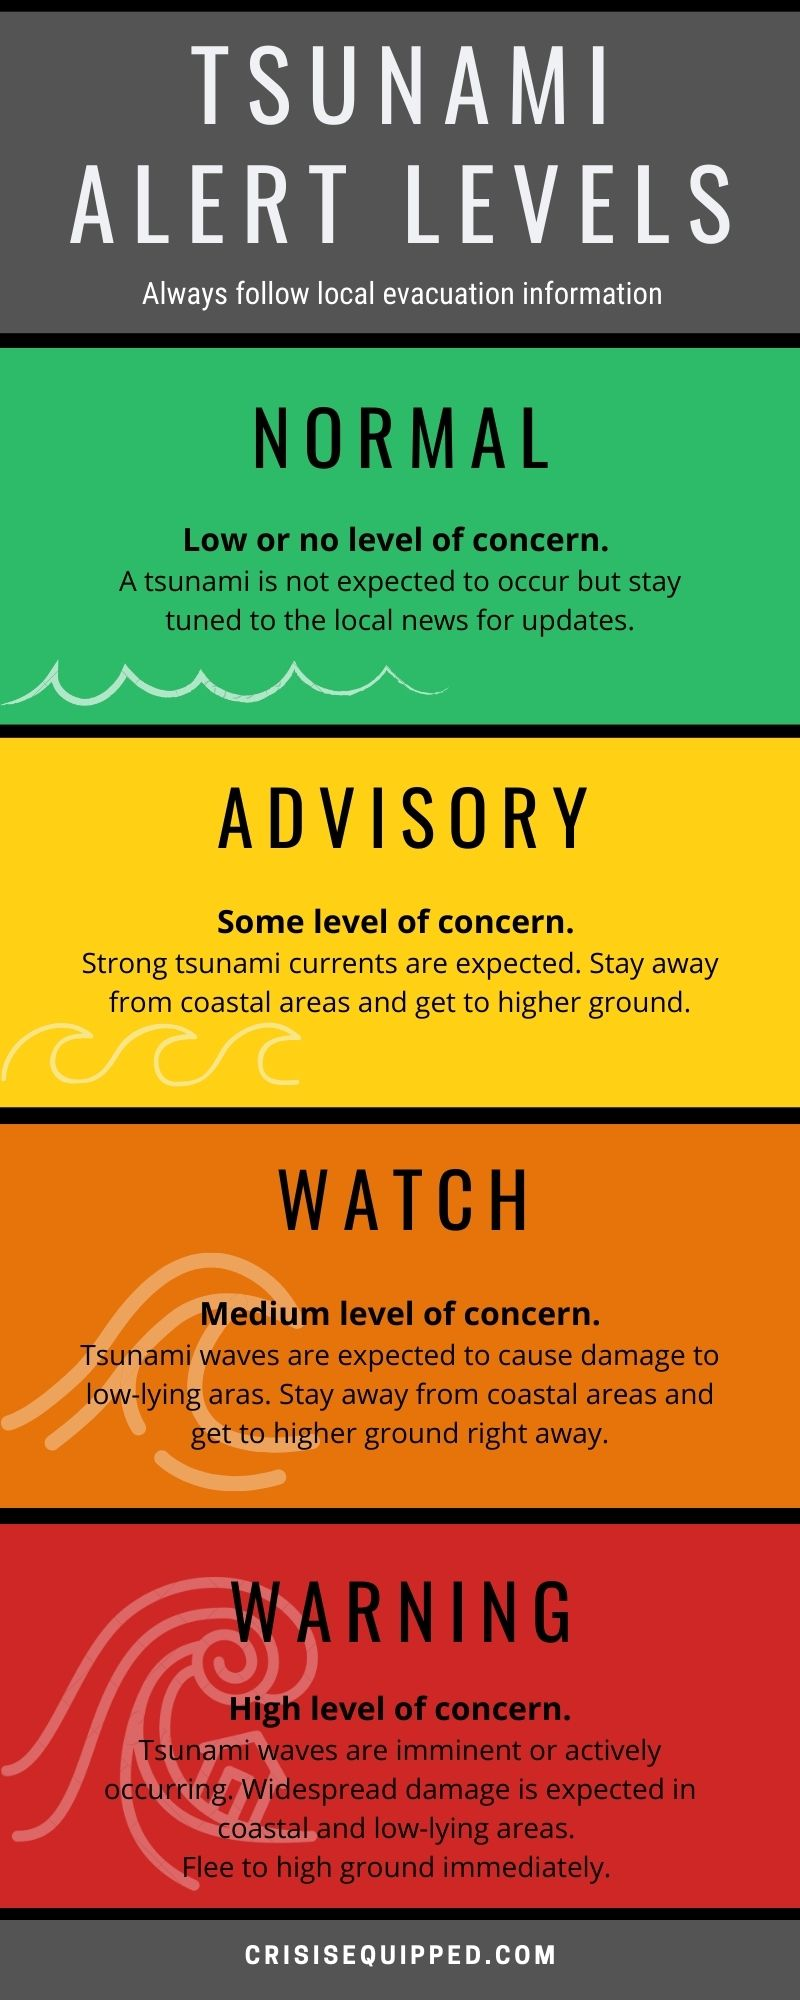 Tsunami Alert Levels